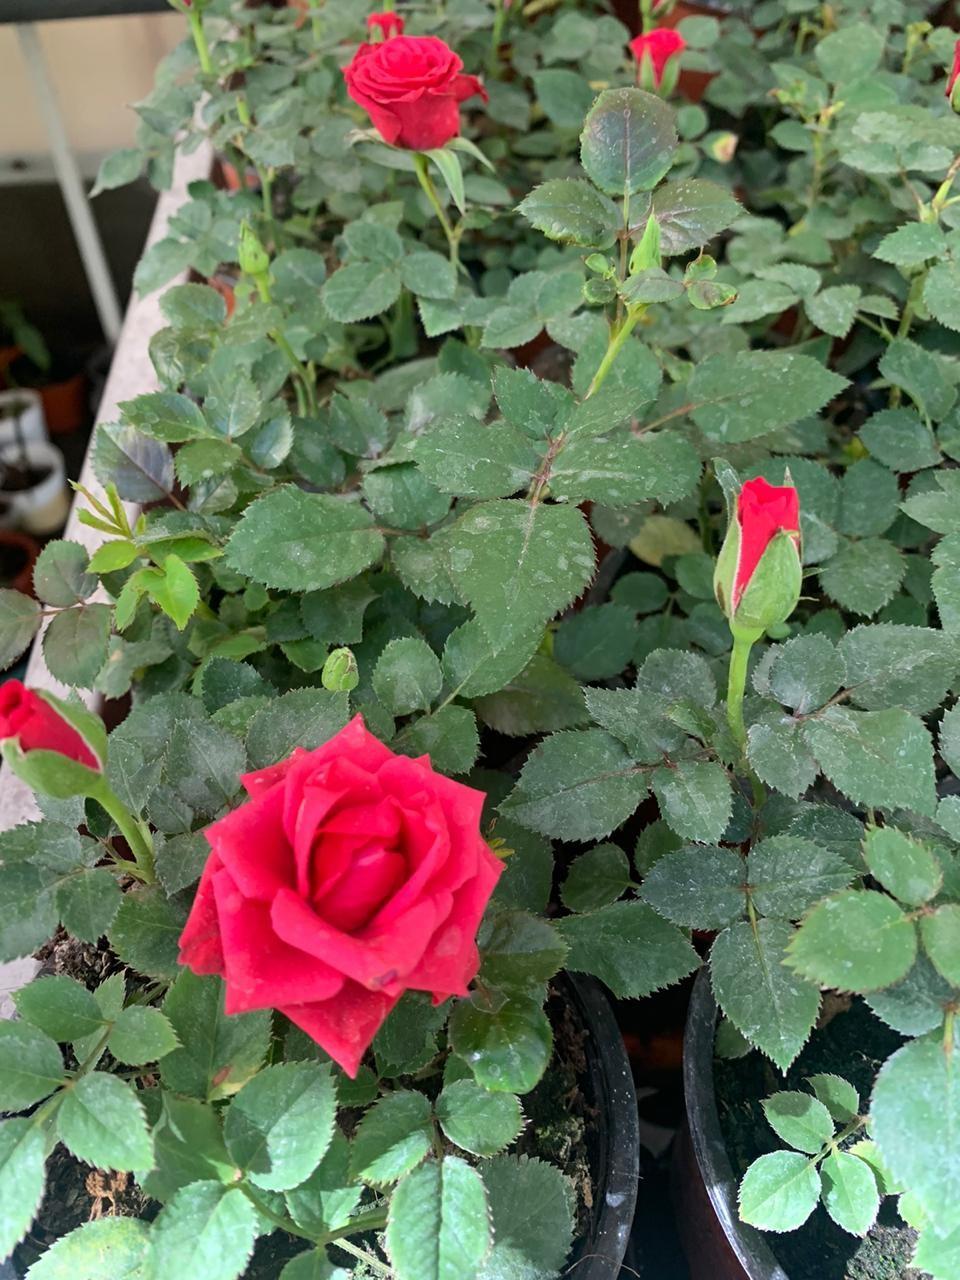 Rosa enana macetero chico